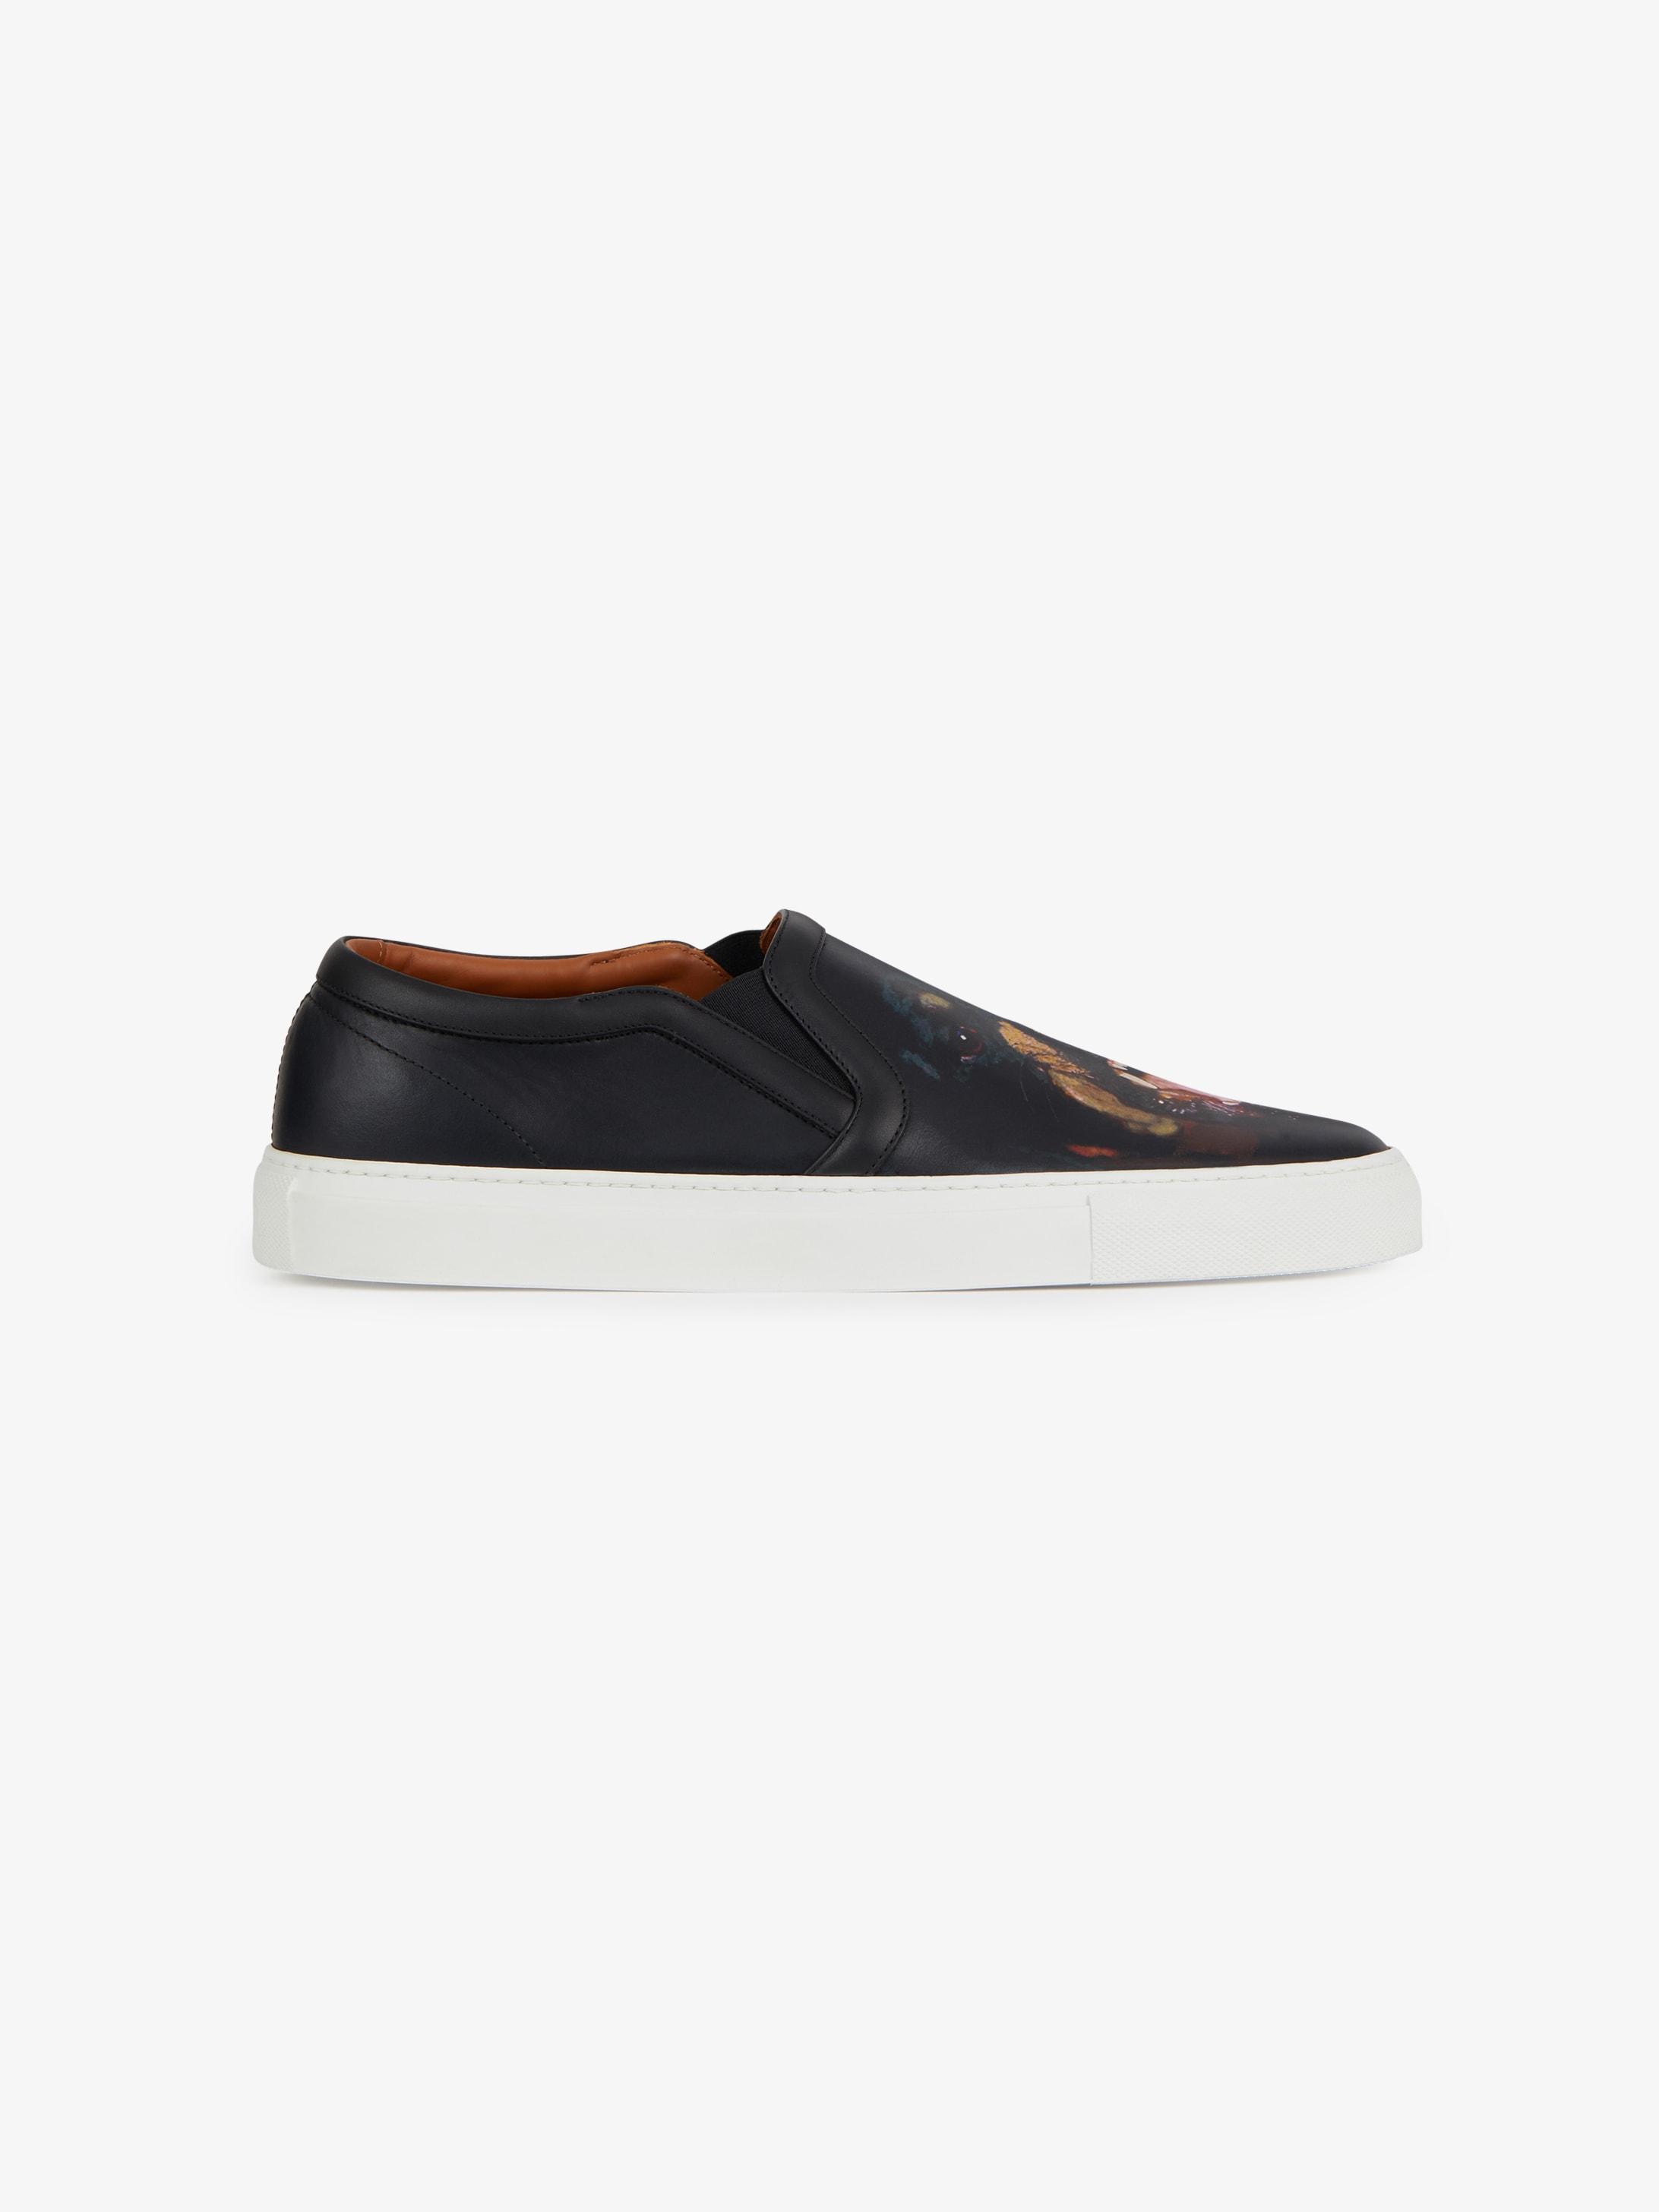 Rottweiler printed skate shoes